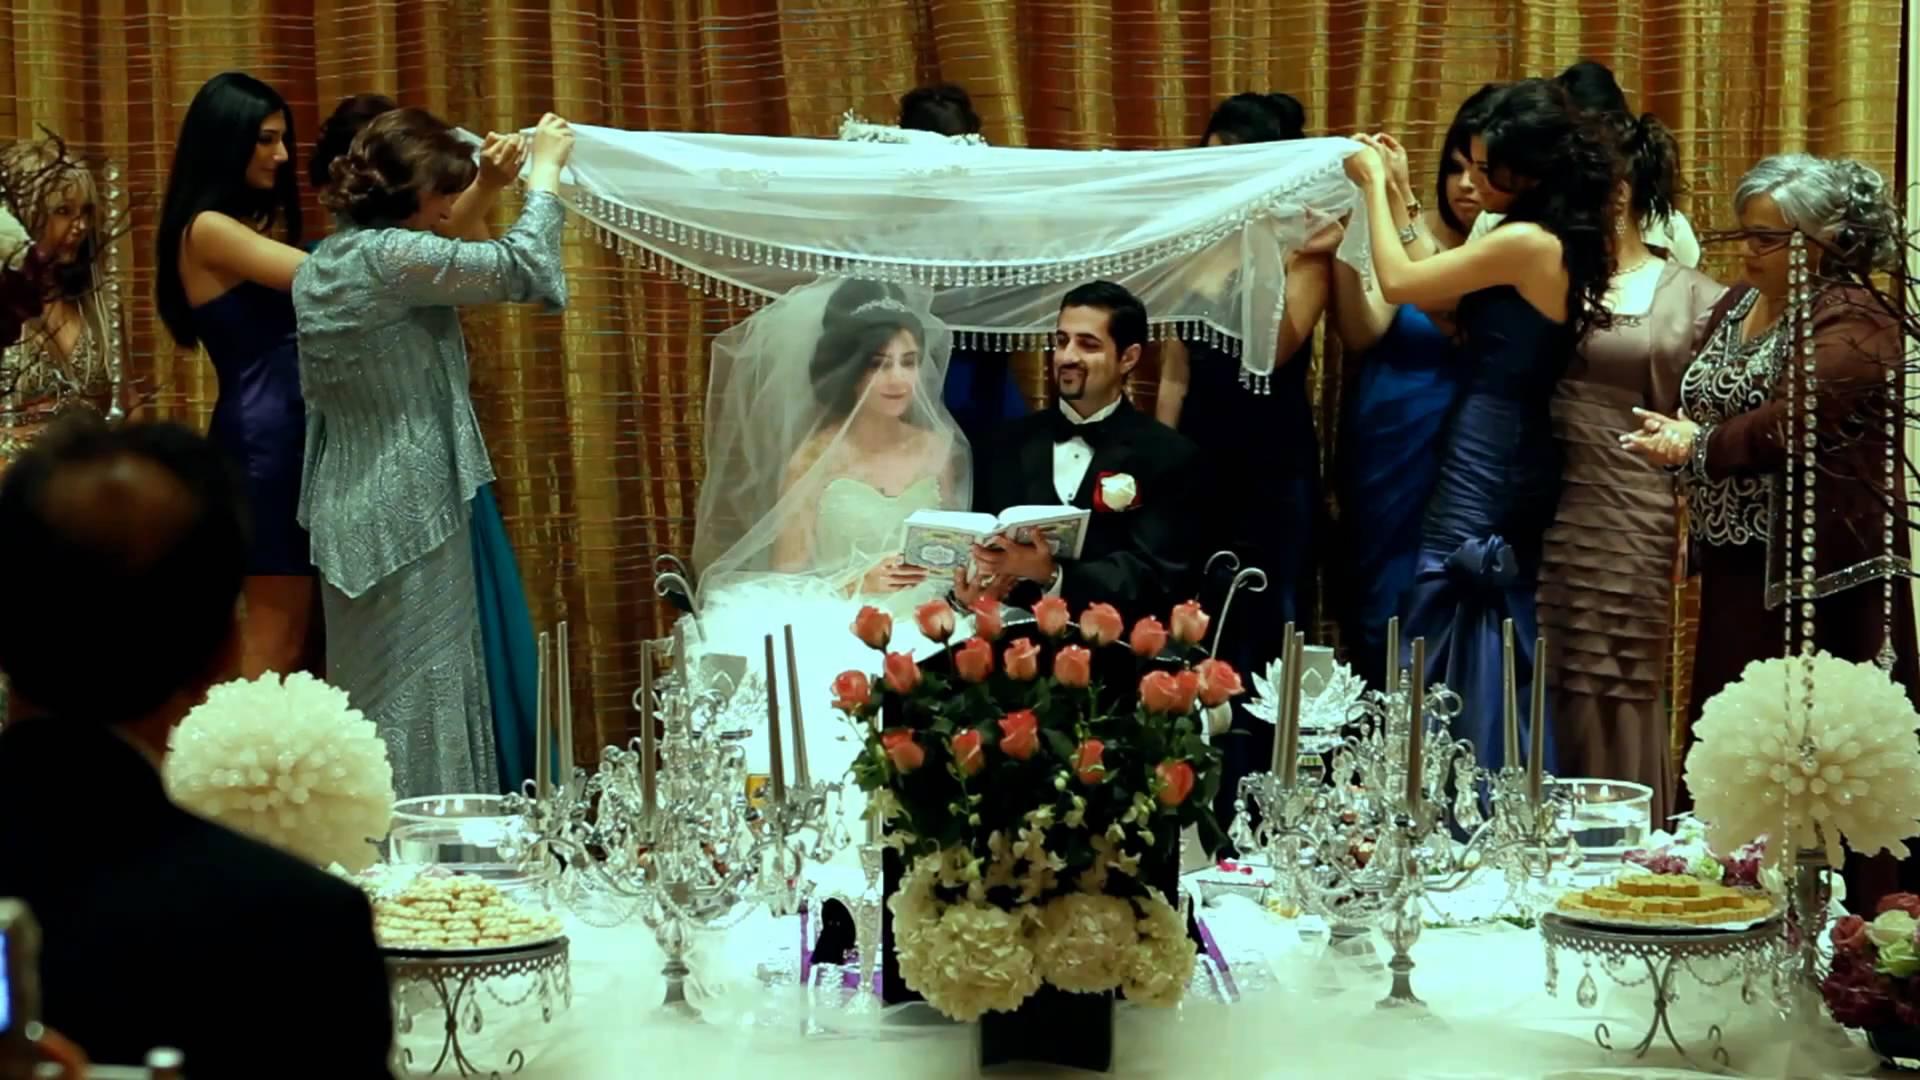 Praktik Budaya Pernikahan Di Iran